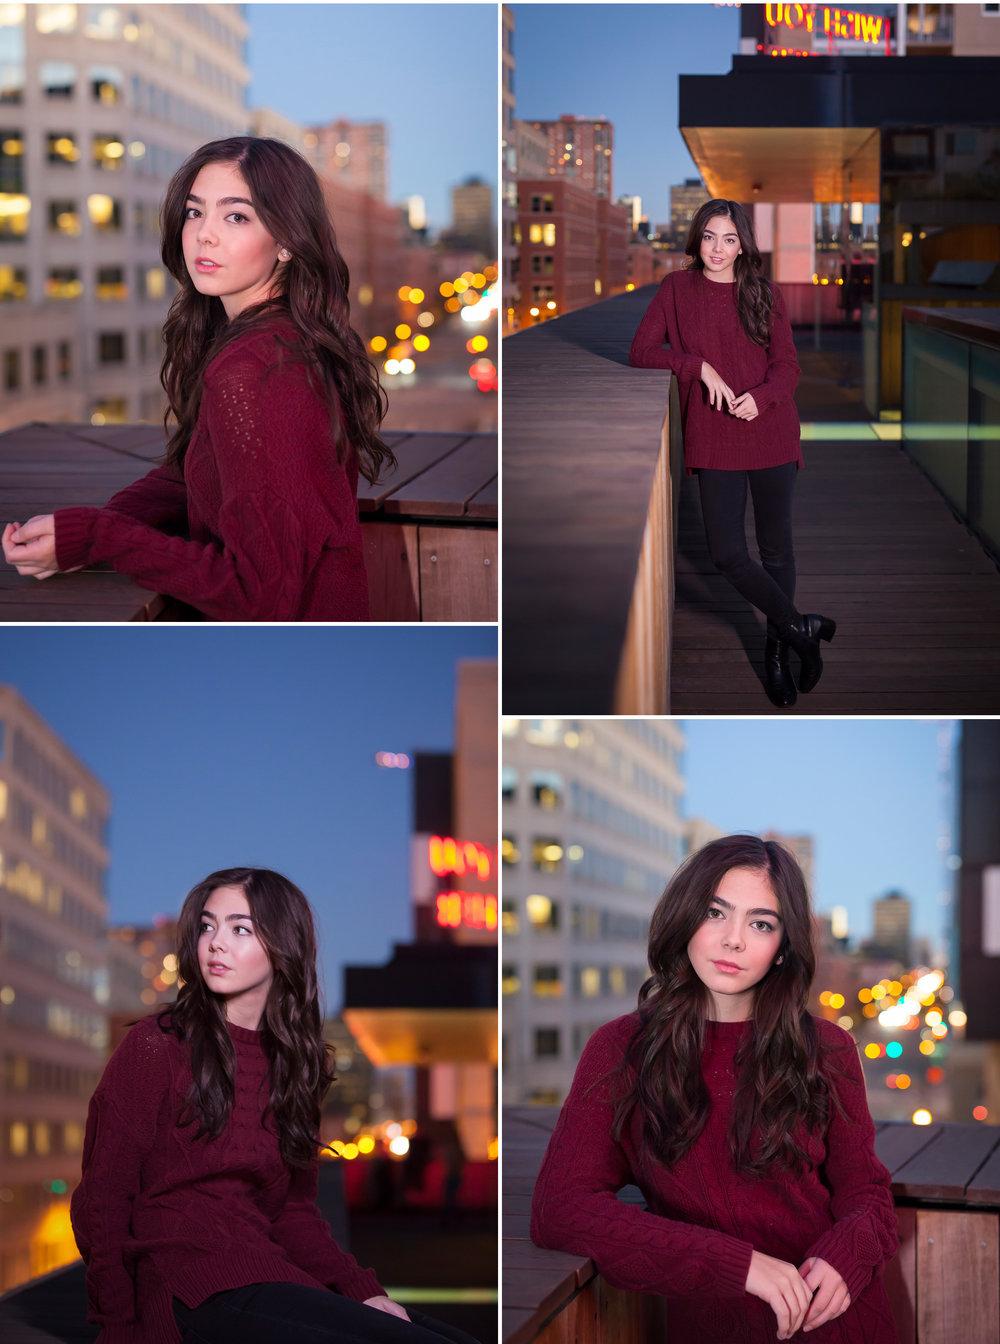 Urban rooftop high school senior pictures with twinkling lights at twilight with photographer Jennifer Koskinen, Merritt Portrait Studio